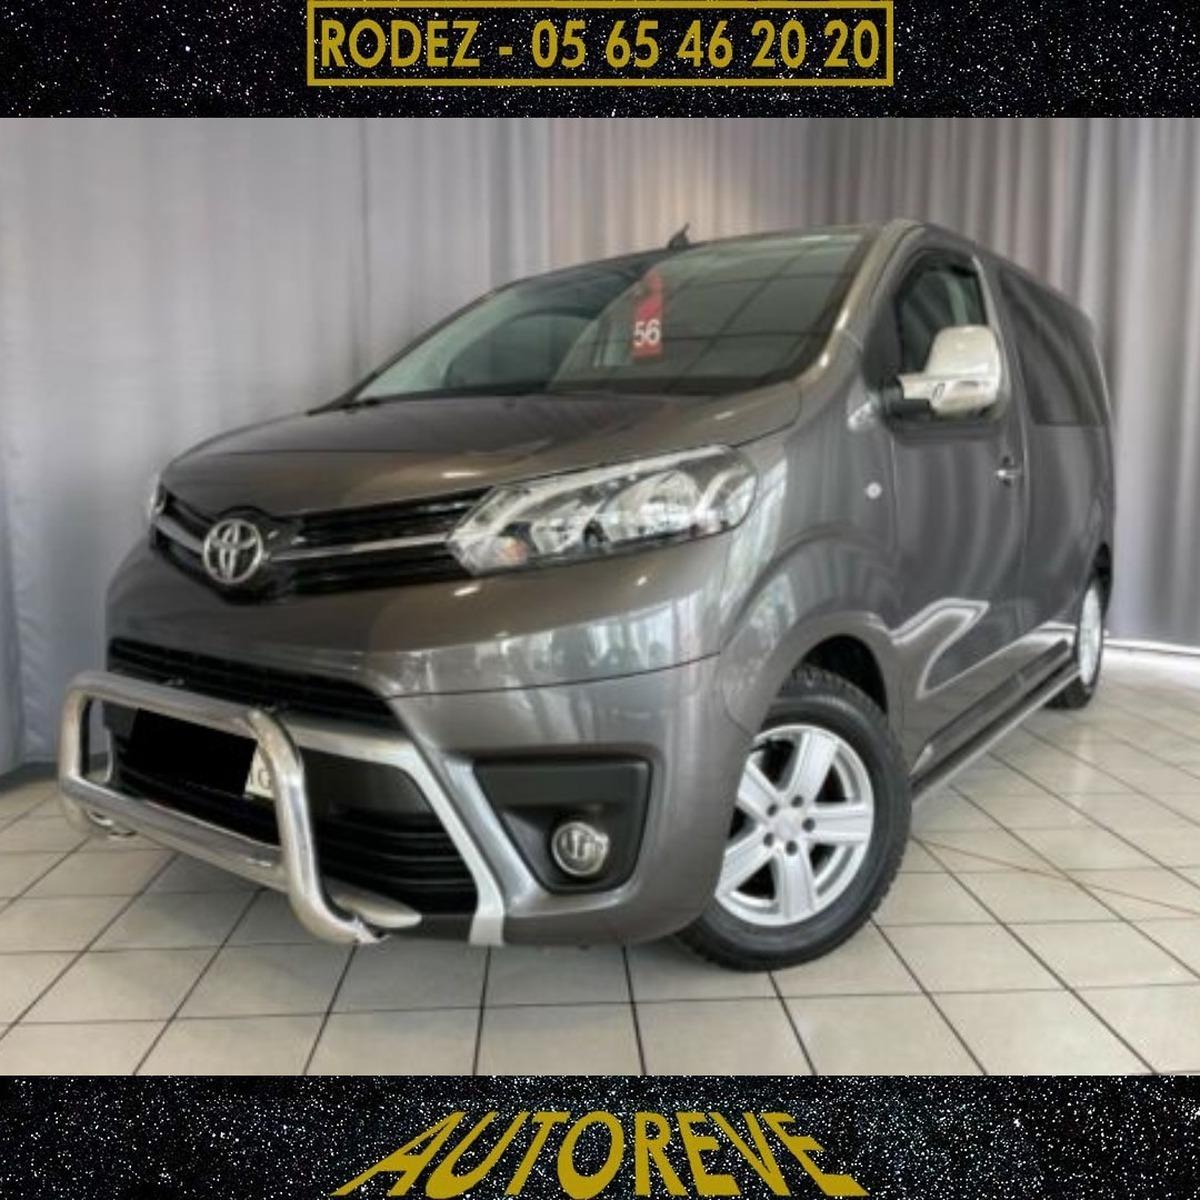 Toyota ProAce (Verso) 1,6-l-D-4D